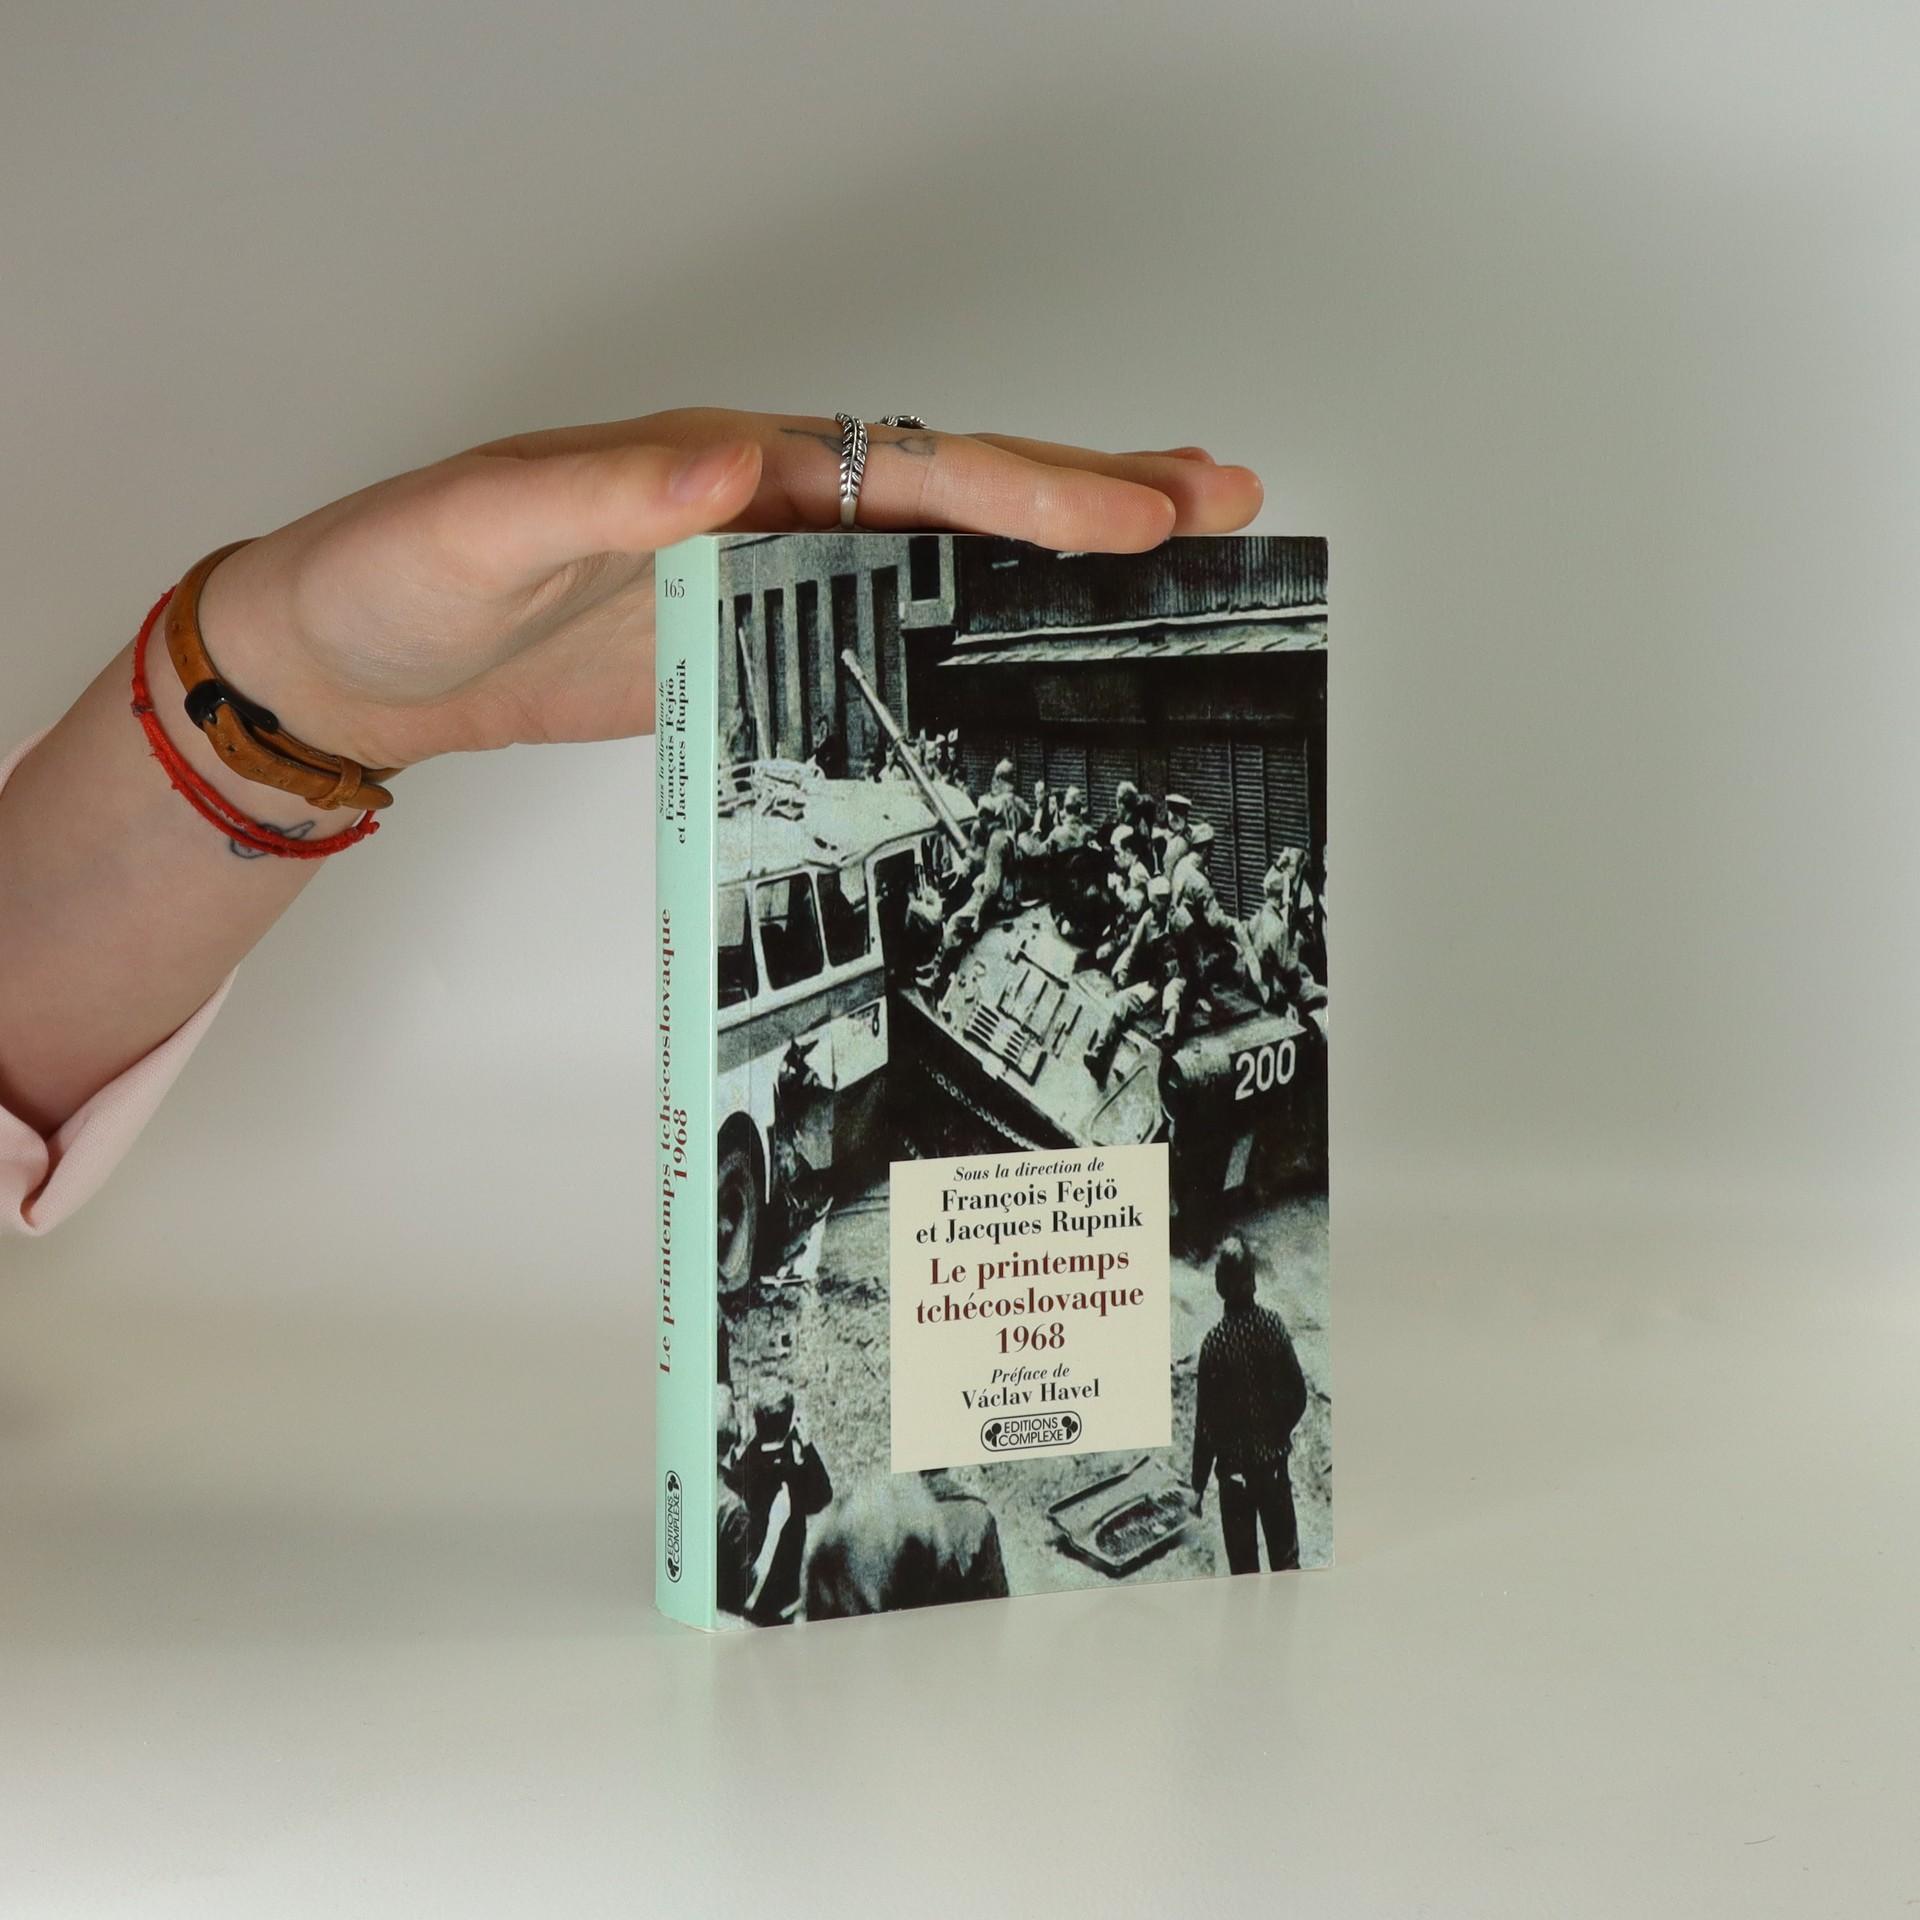 antikvární kniha Le printemps tchćoslovaque 1968, 2008